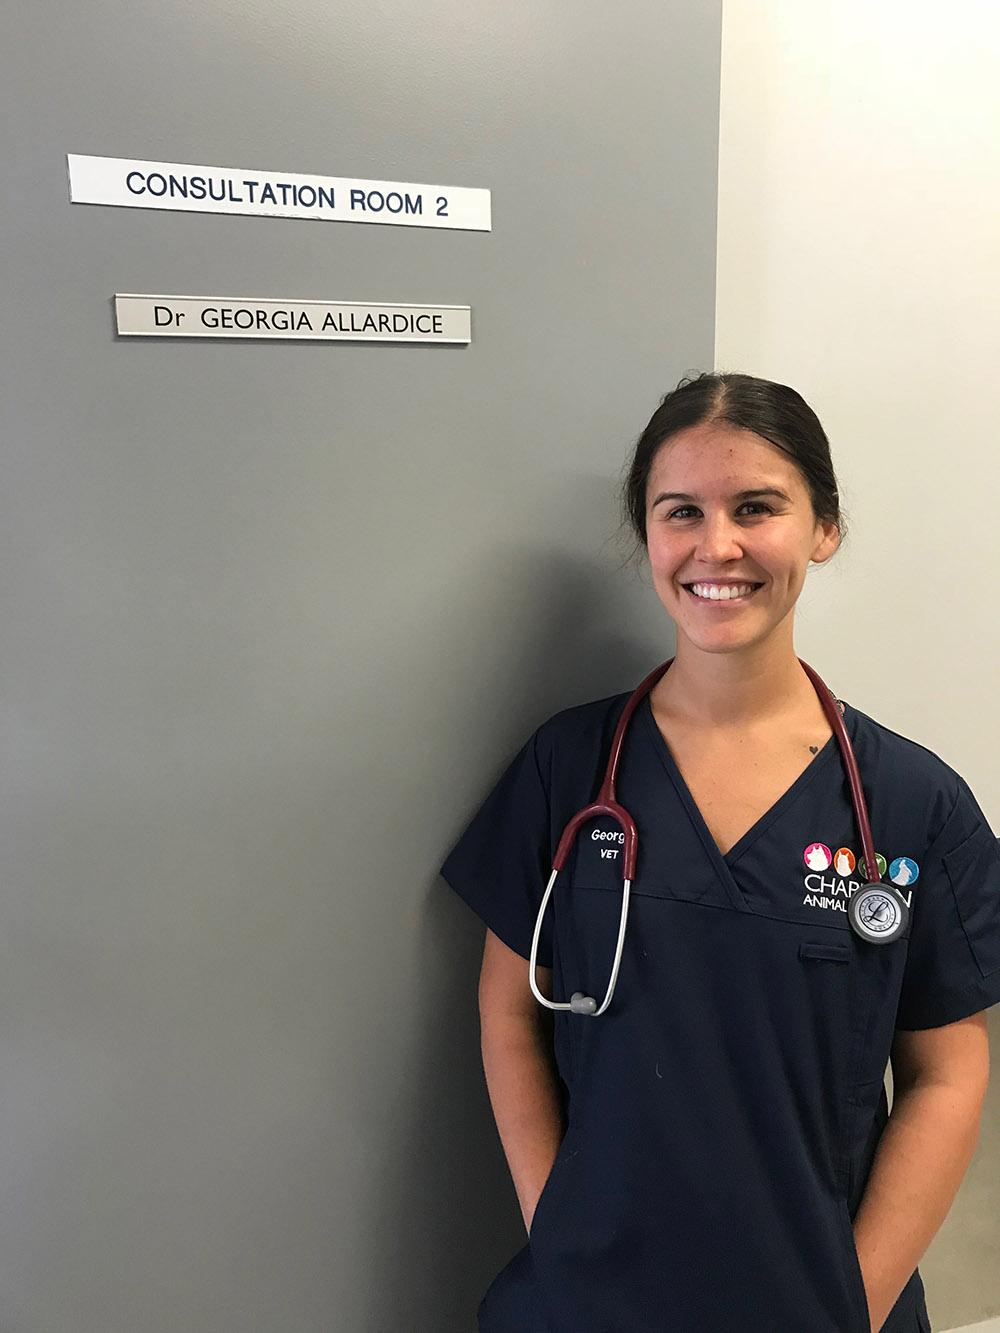 Dr. Georgia Allardice